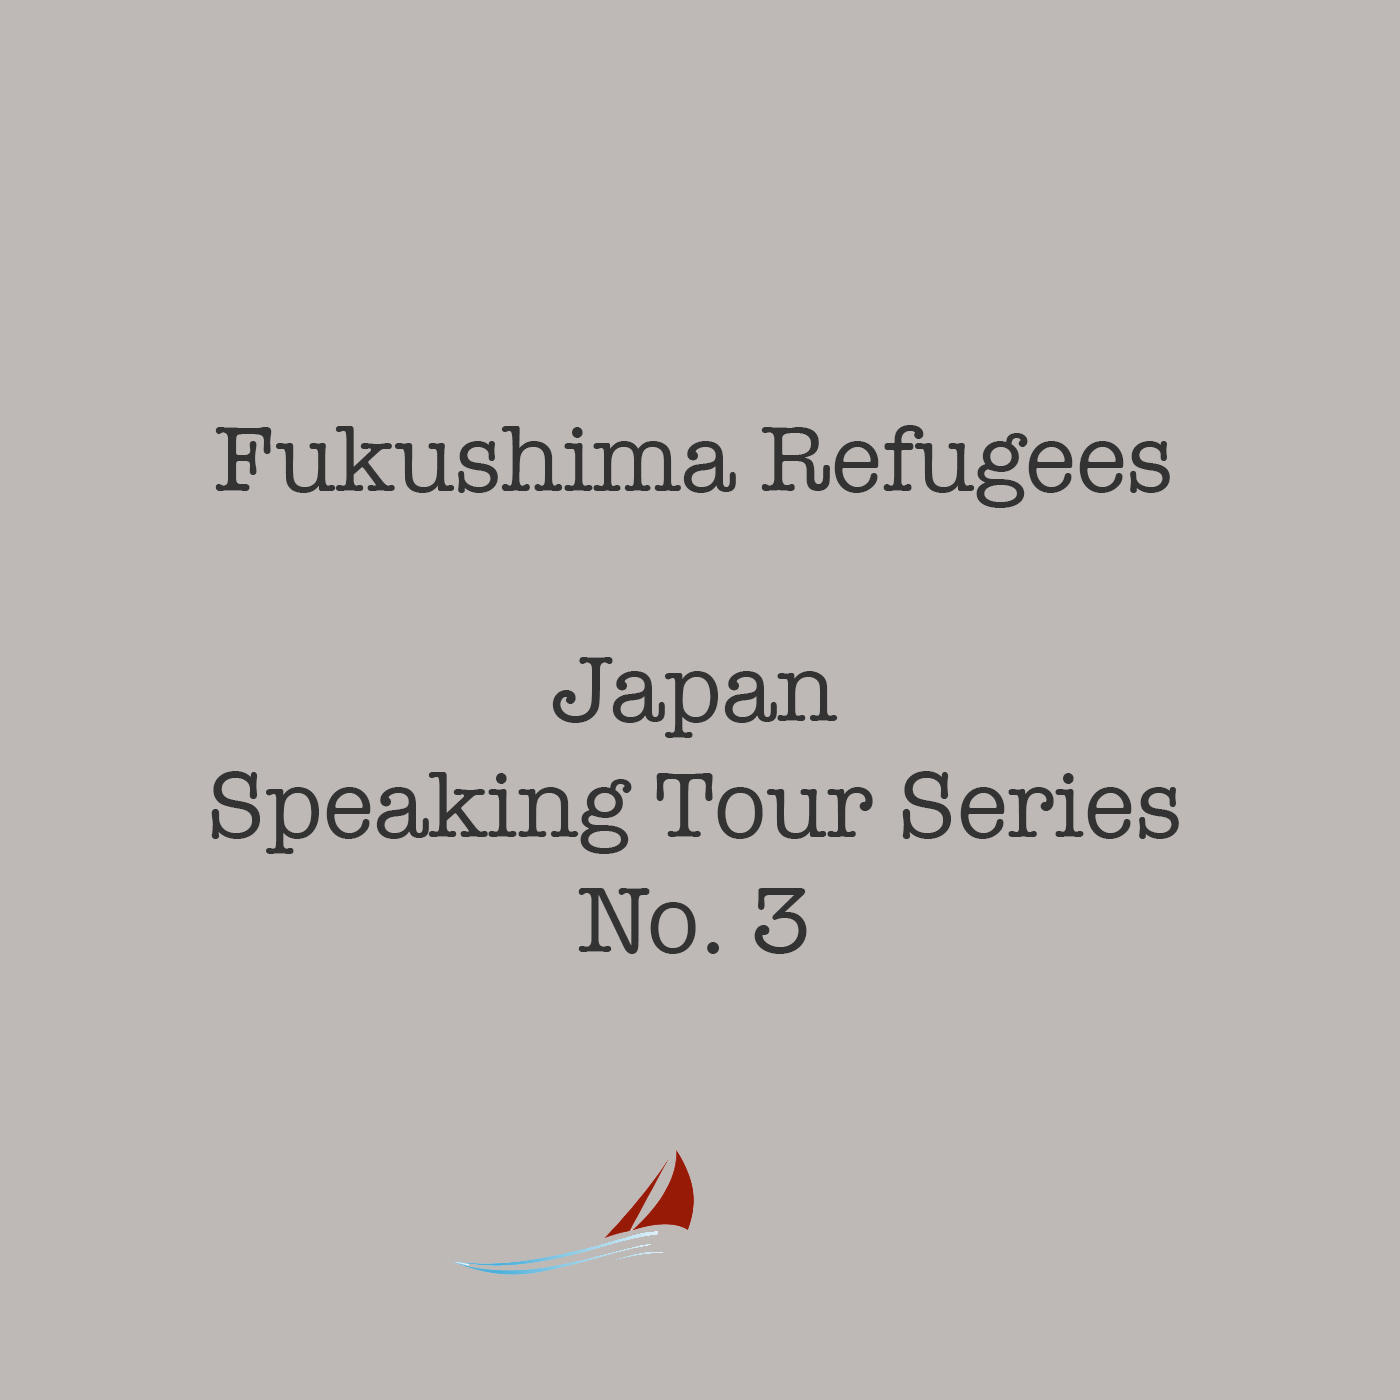 fukushimarefugees.jpg